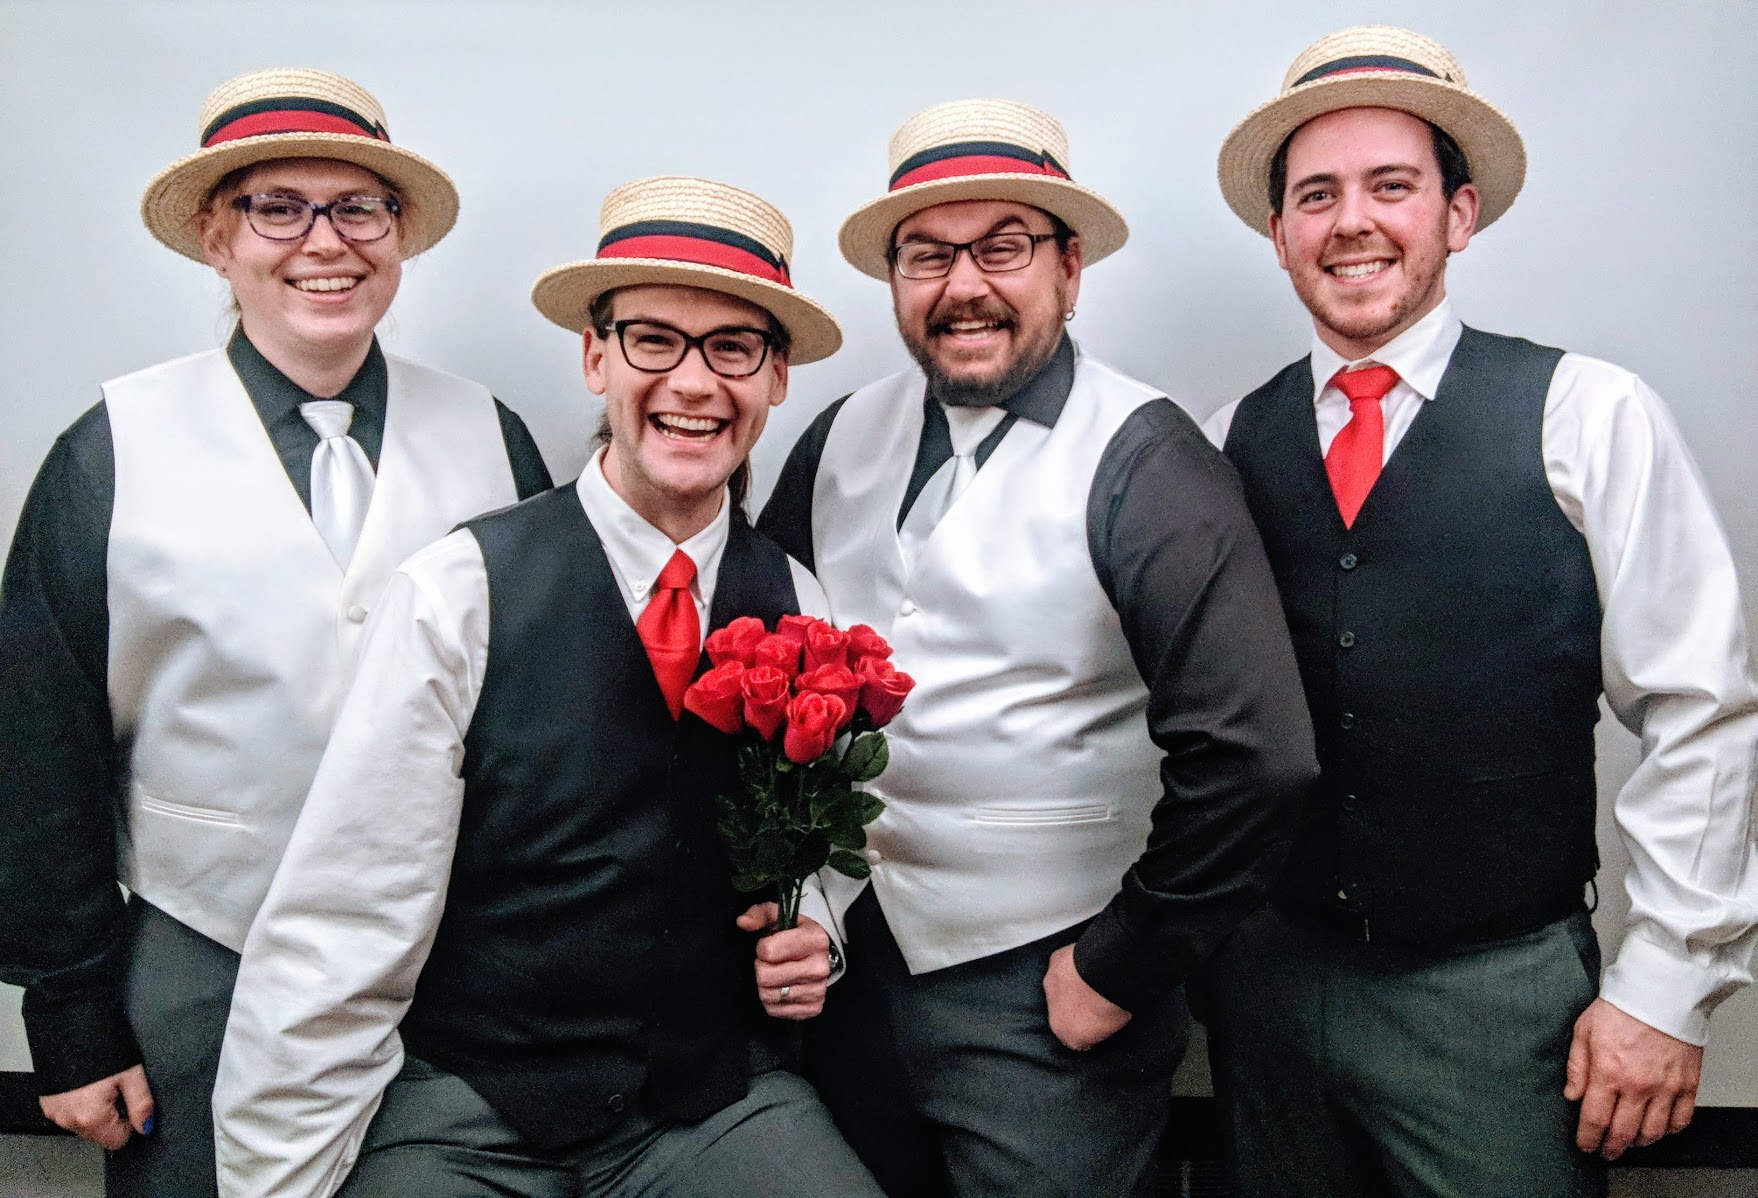 Pickup Stix Quartet delivering a Videogram to a lucky recipient